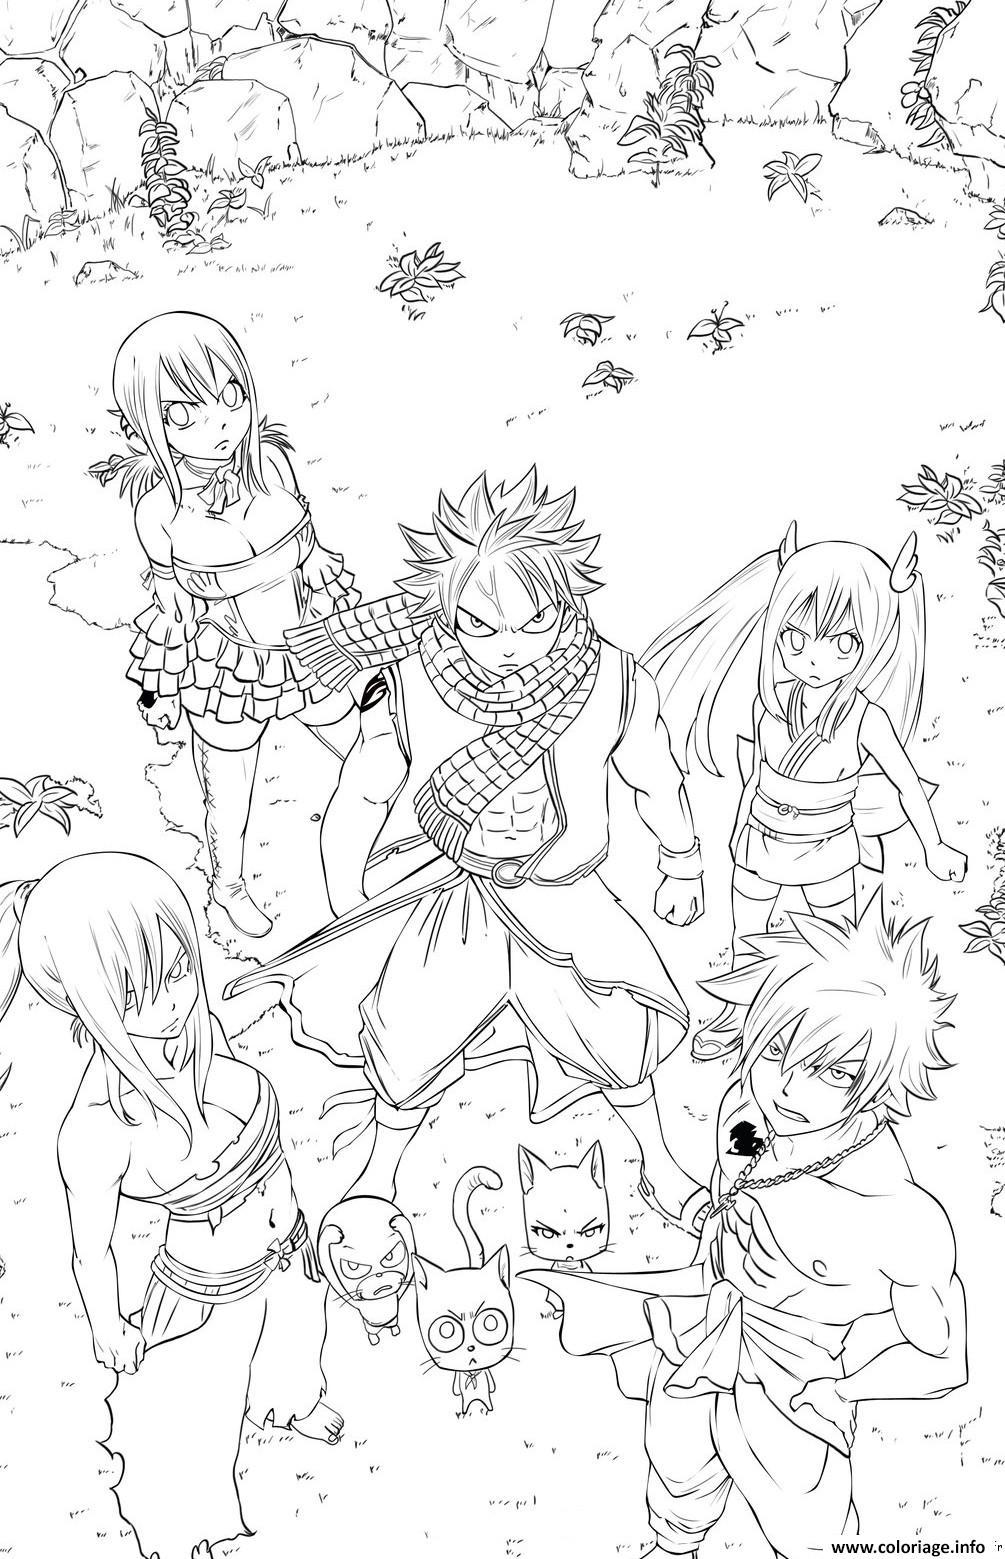 Coloriage natsu dessin - Dessin de manga a colorier ...